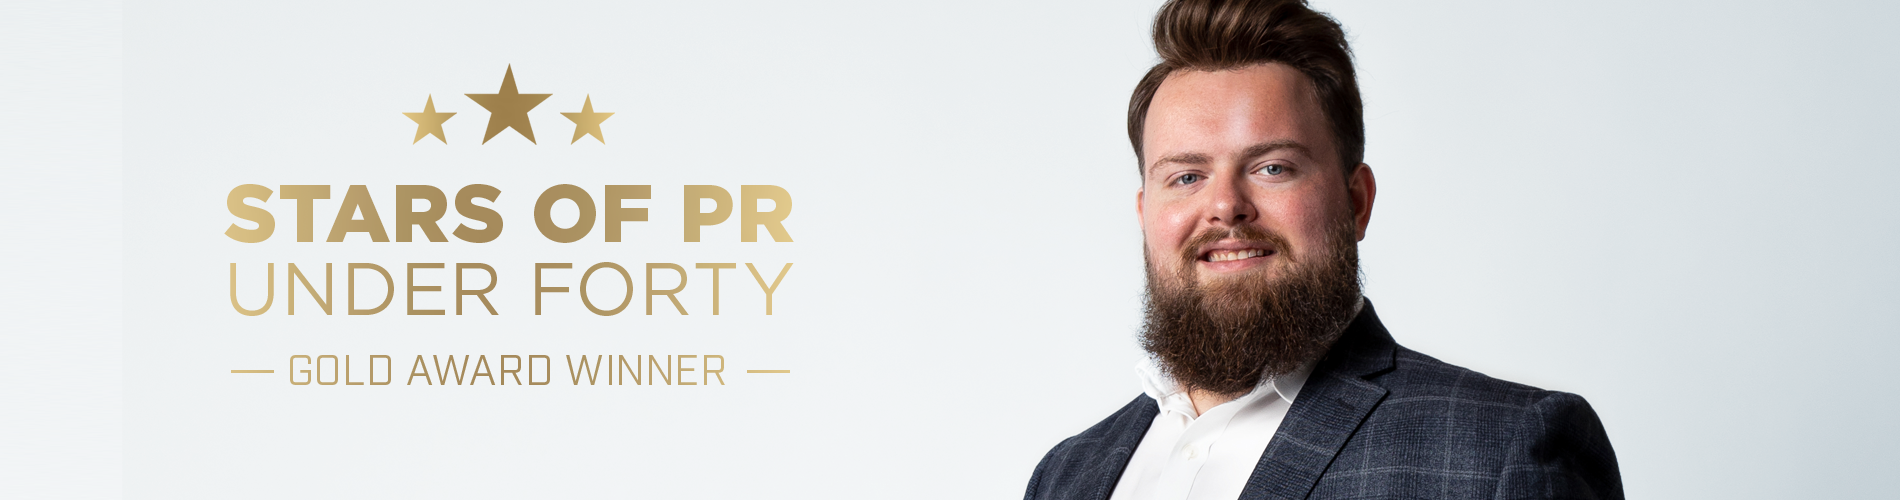 "RP3's Max Marcucci Named Top ""PR Star Under 40"" by Bulldog Reporter"